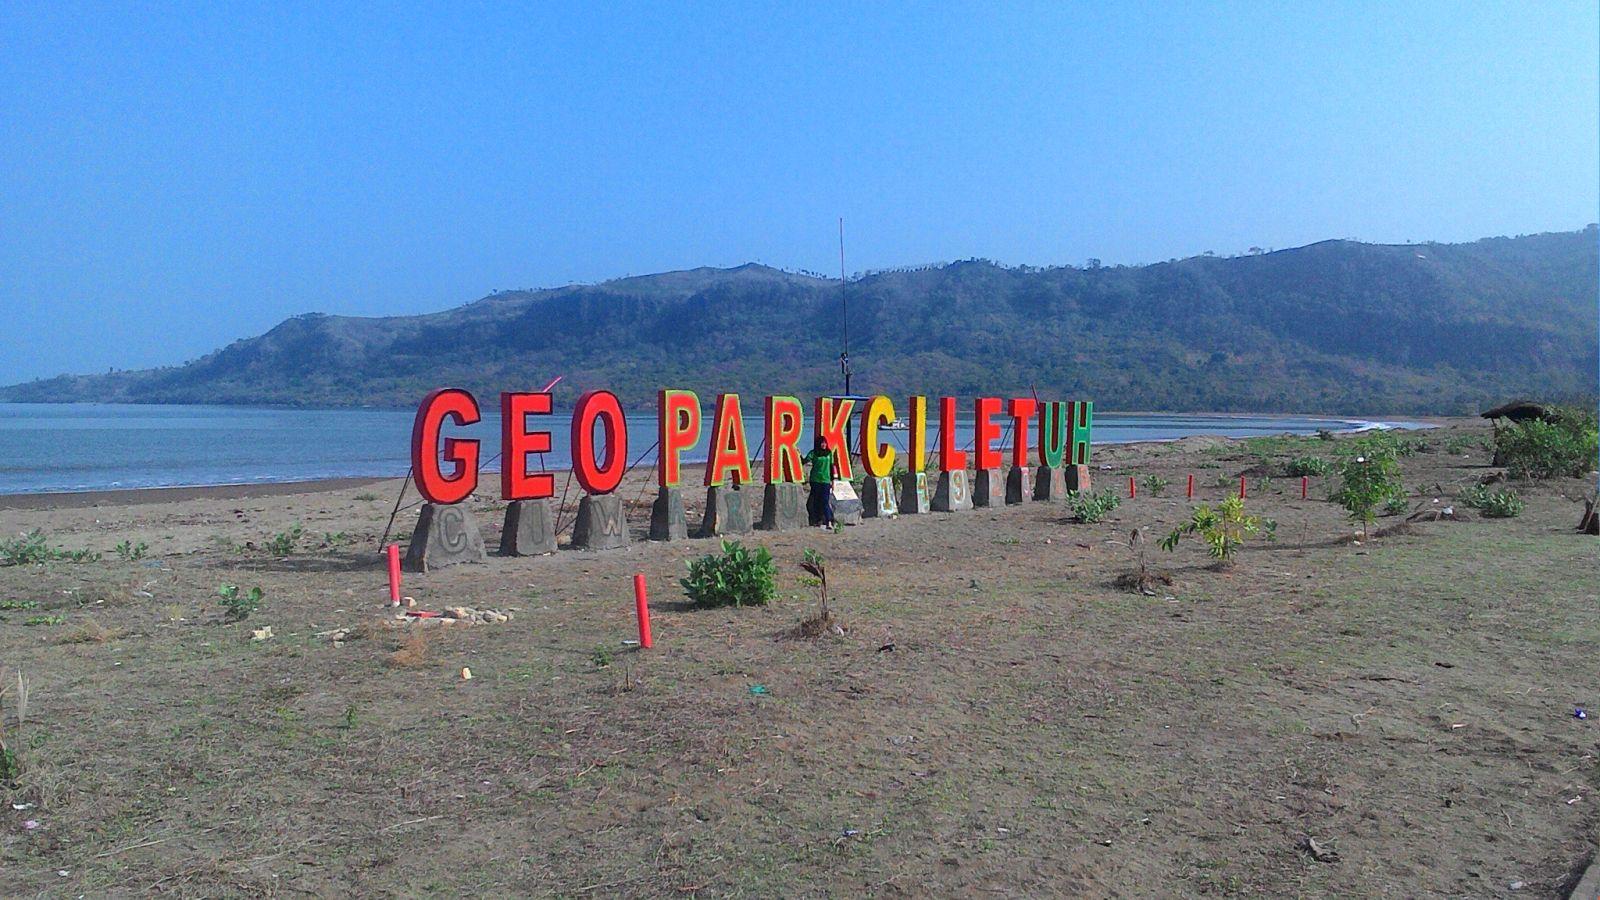 Pesona Ciletuh Geopark Sukabumi yang wajib dikunjungi!!!